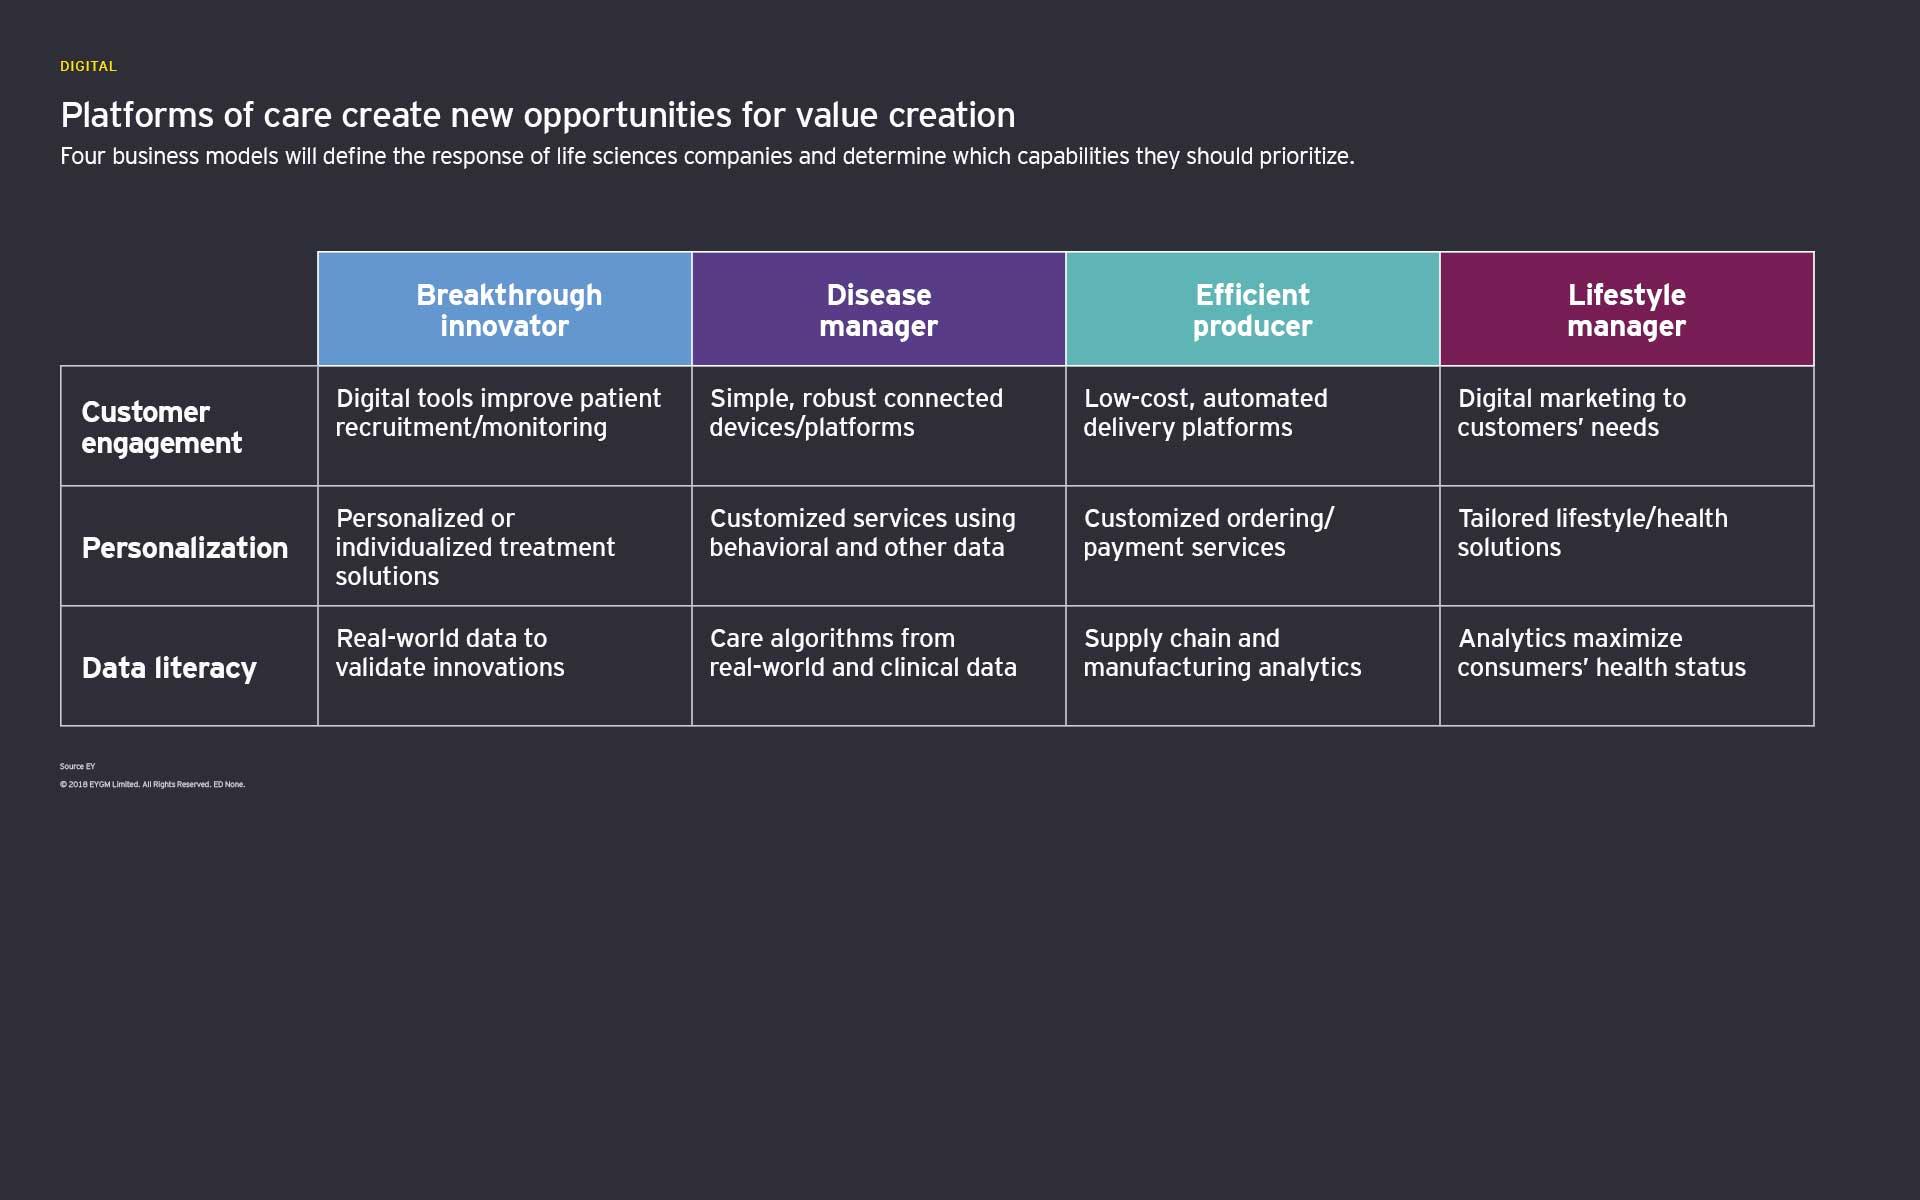 Plataformas de cuidados de saúde criam novas oportunidades